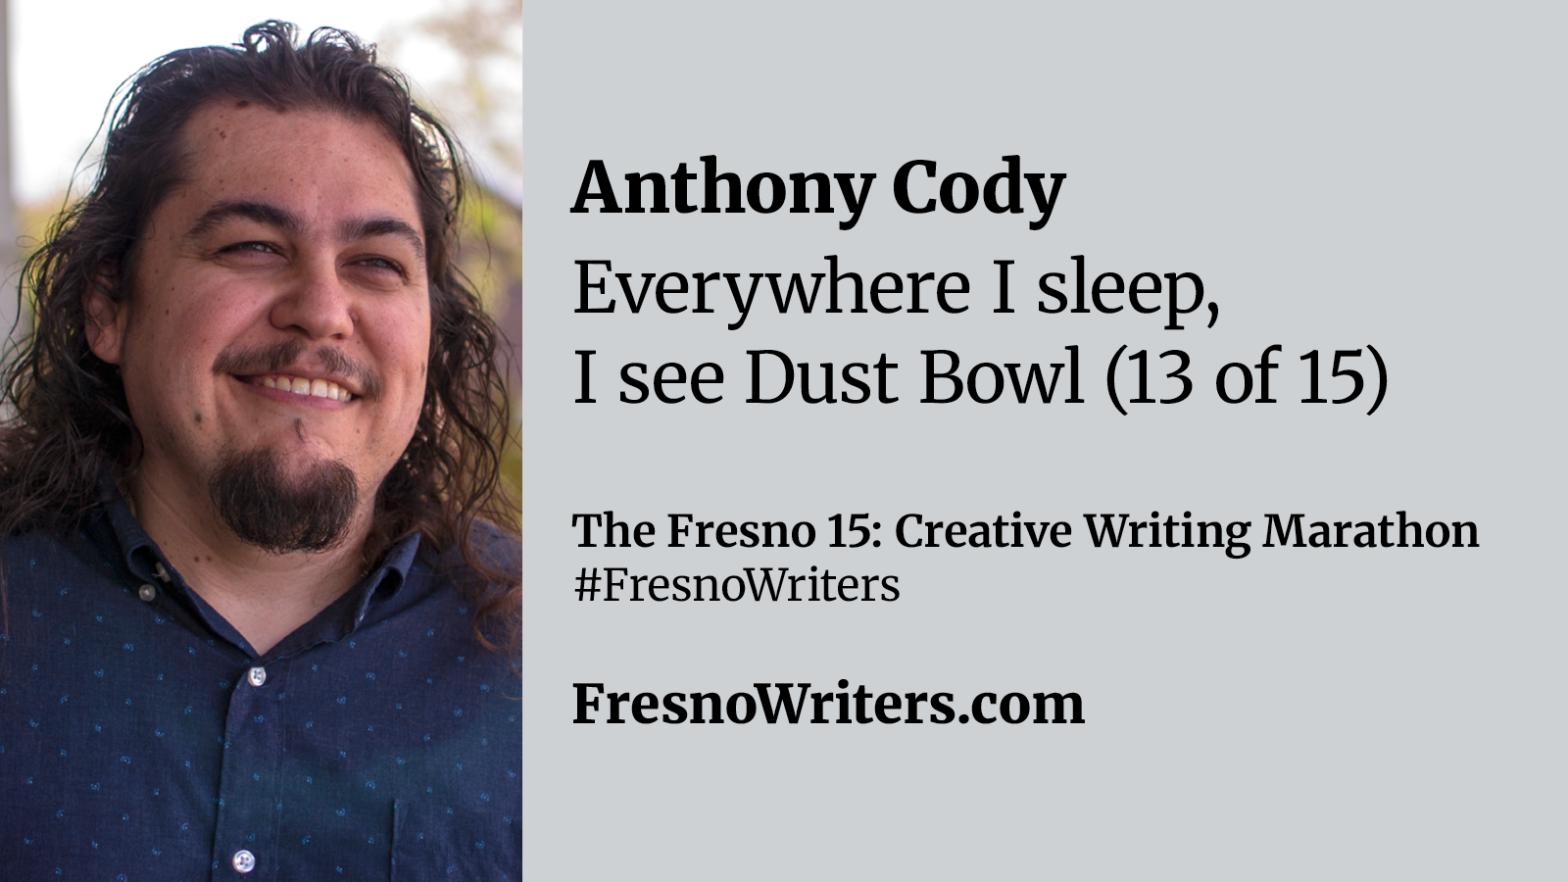 Anthony Cody featured image